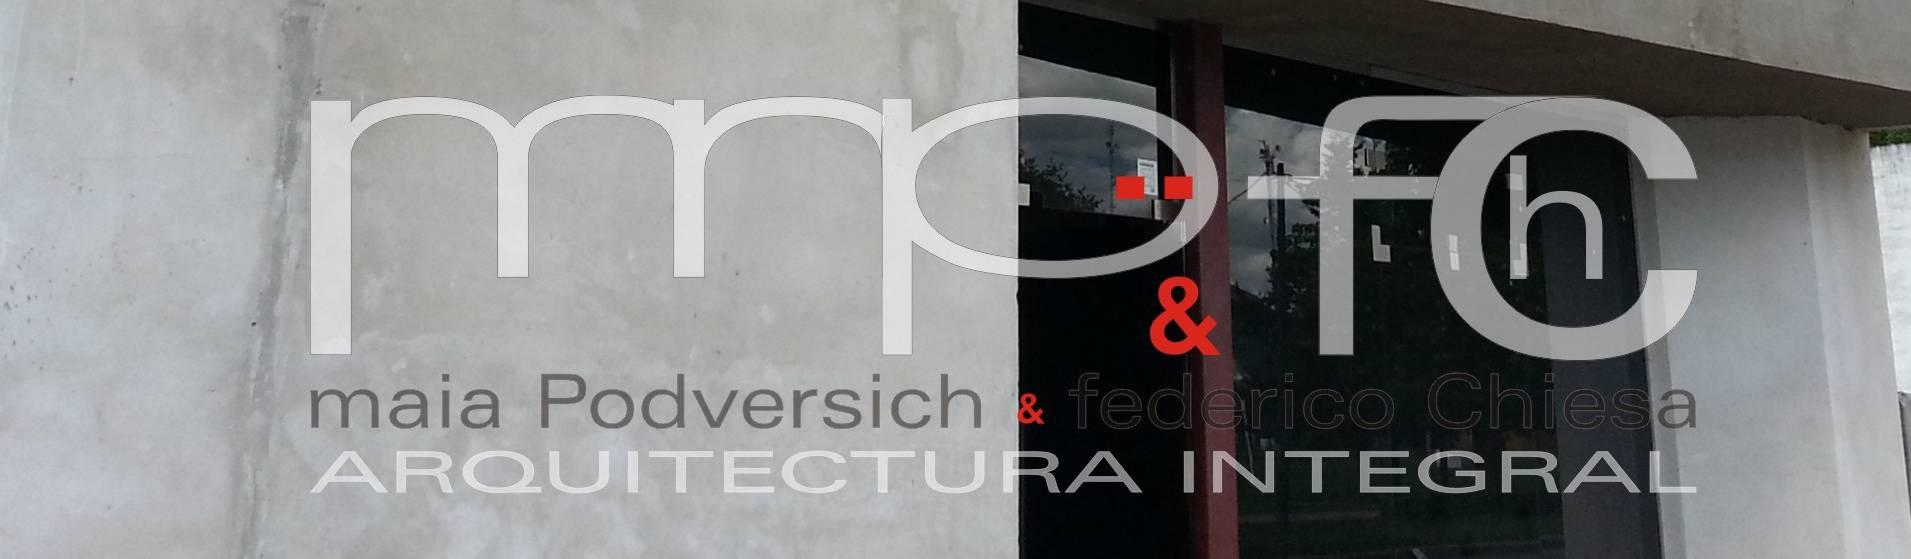 MNP & FCH arquitectura integral